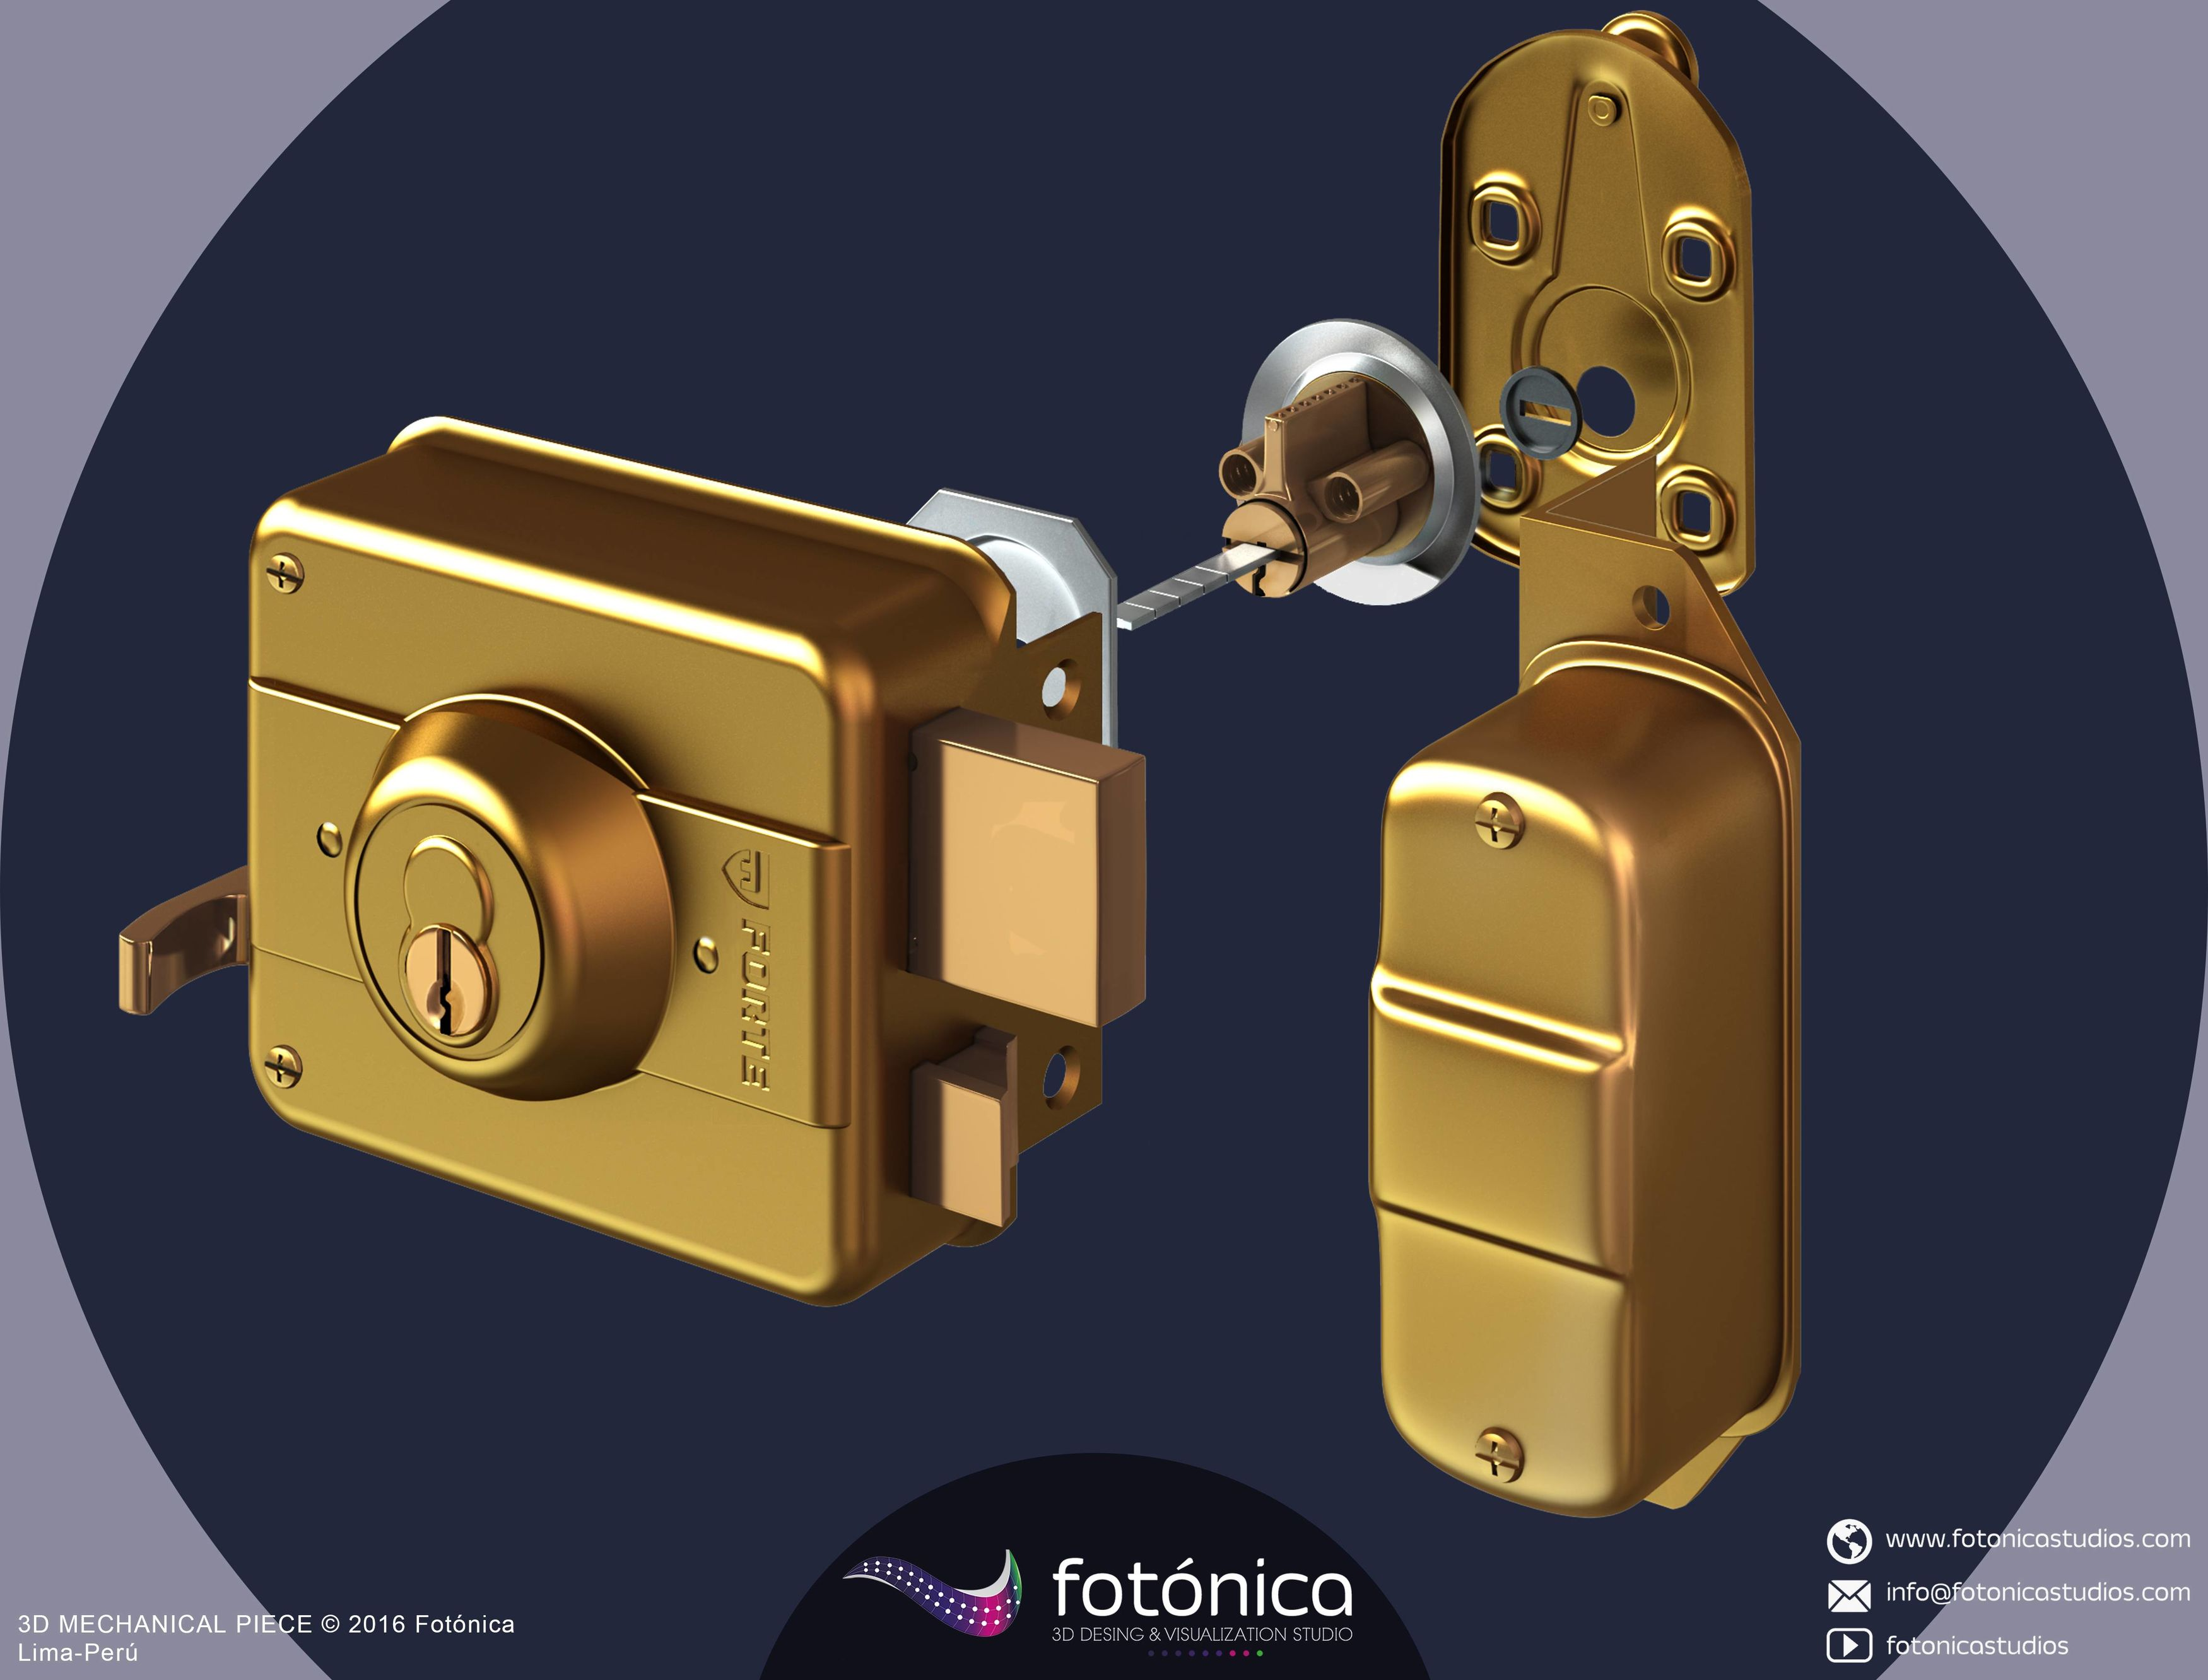 Fotonica-pr12-3500-3500